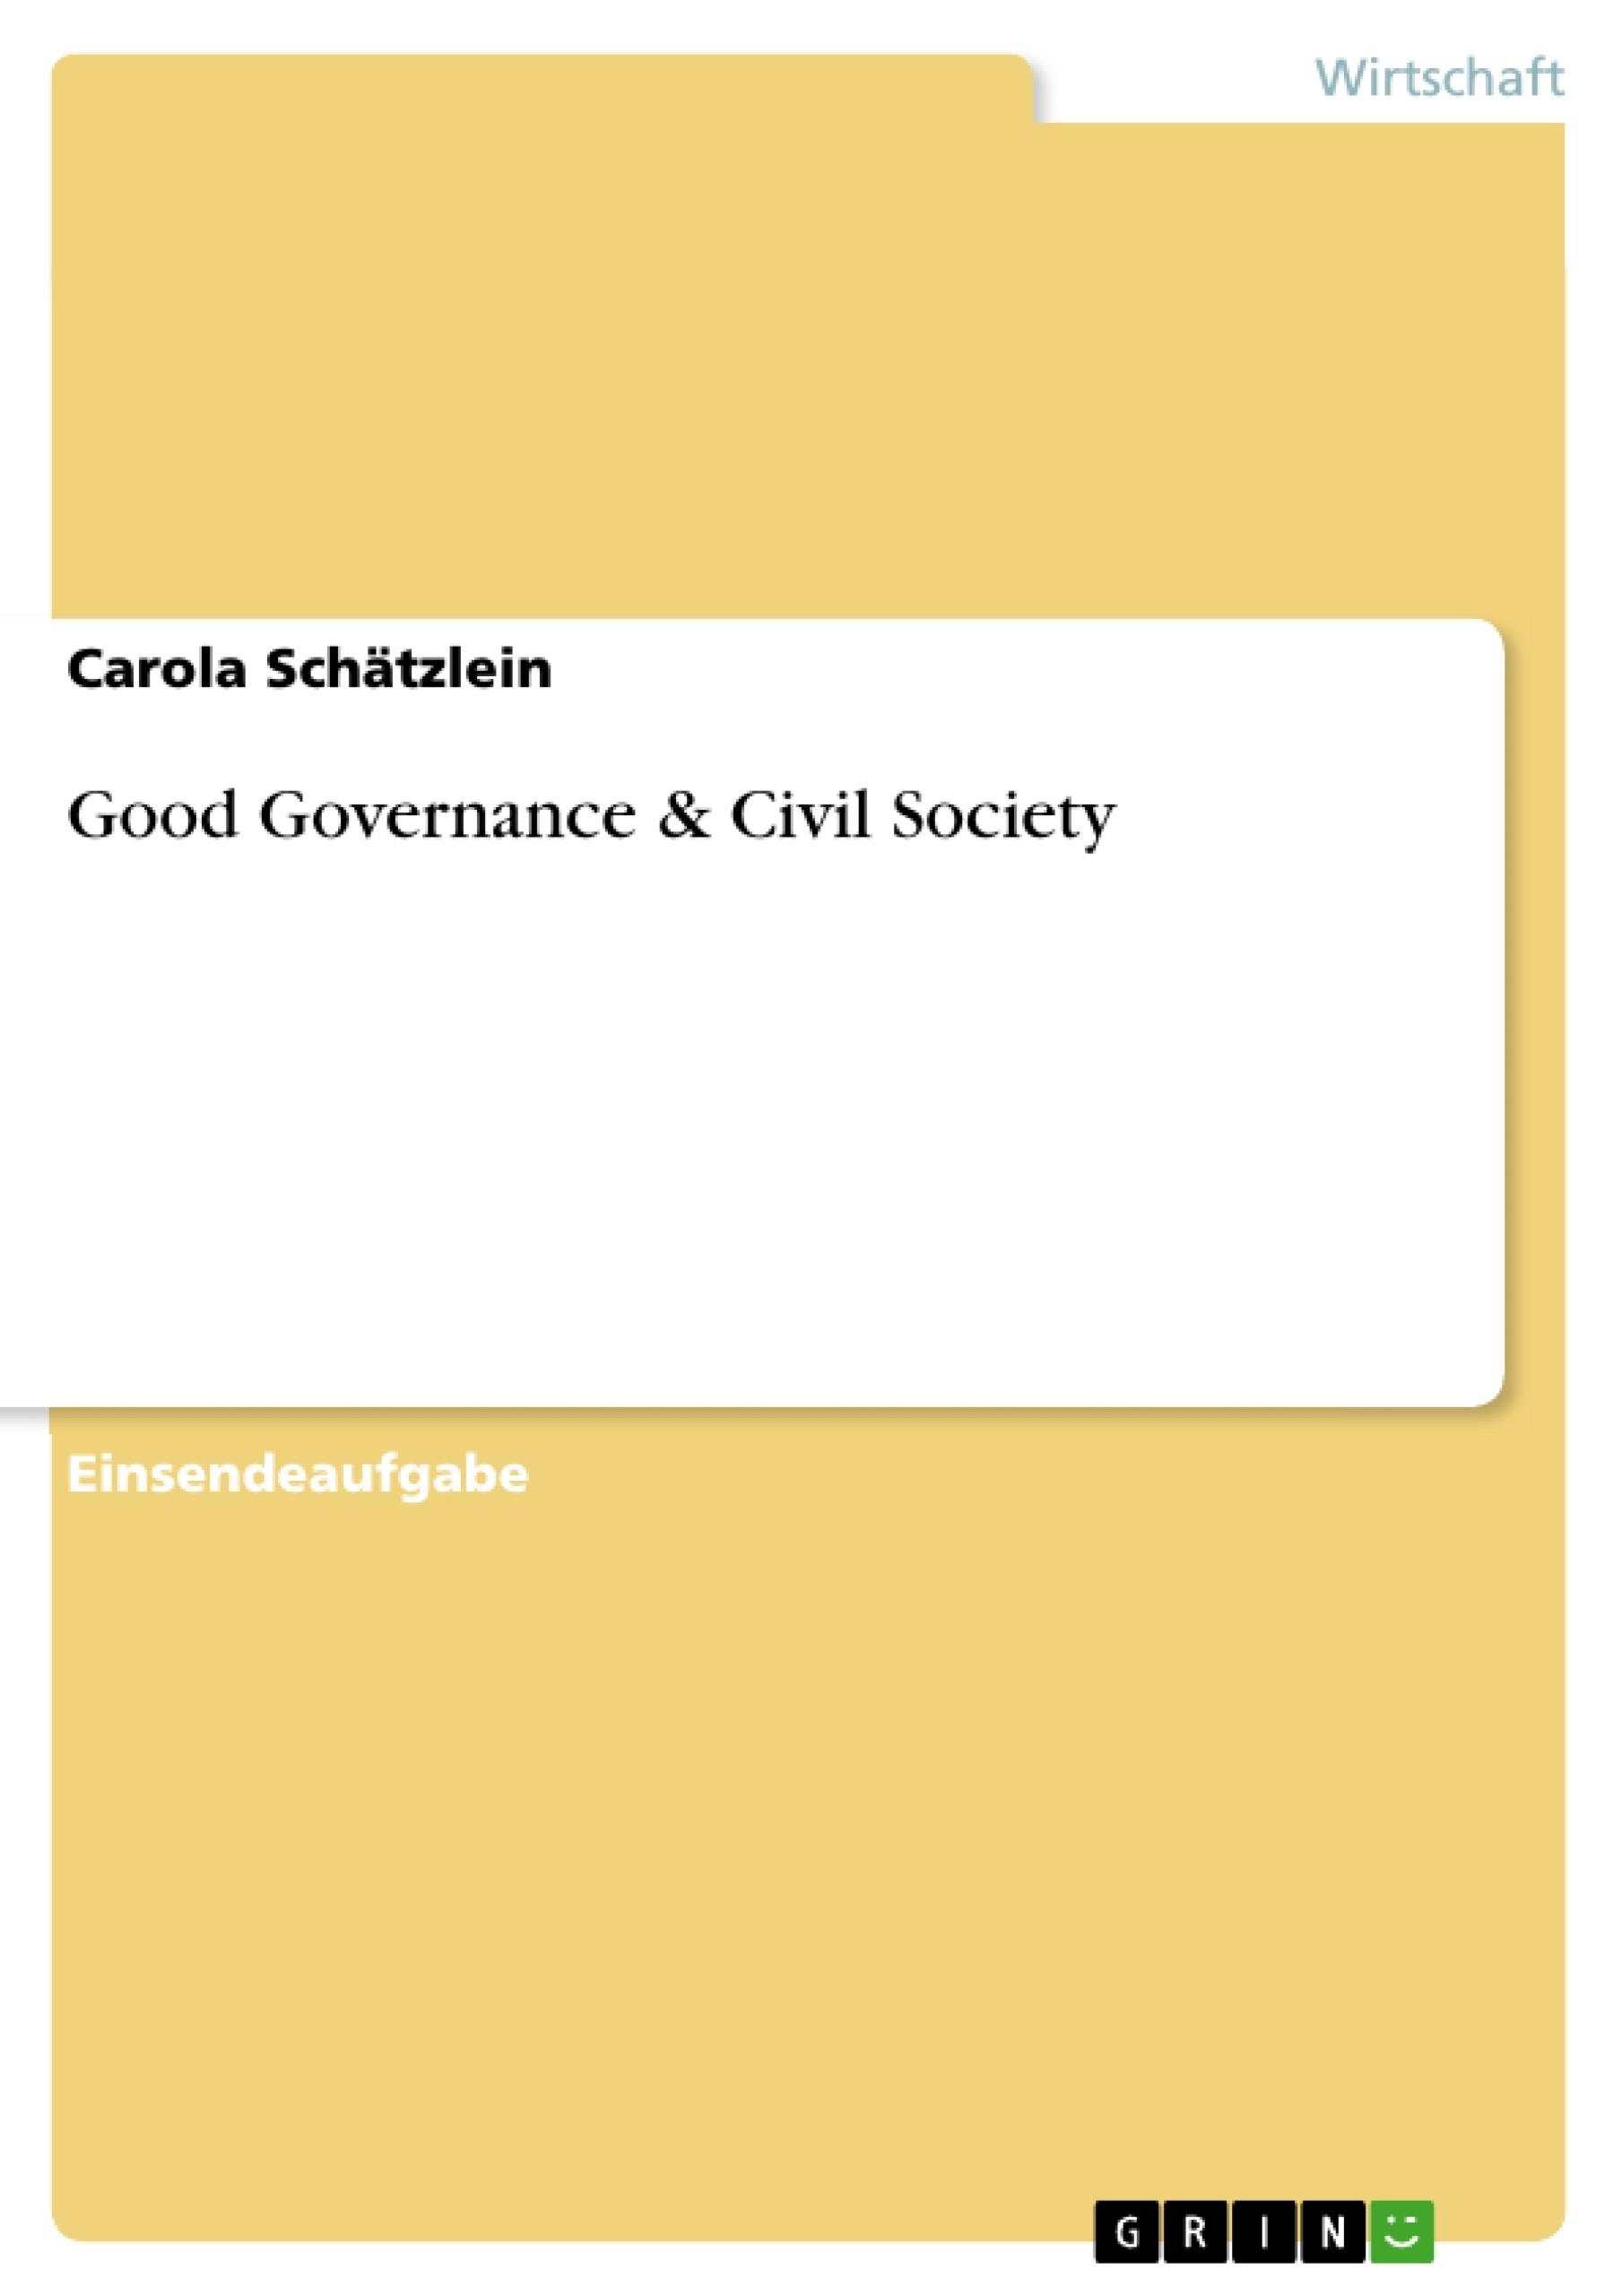 Titel: Good Governance & Civil Society